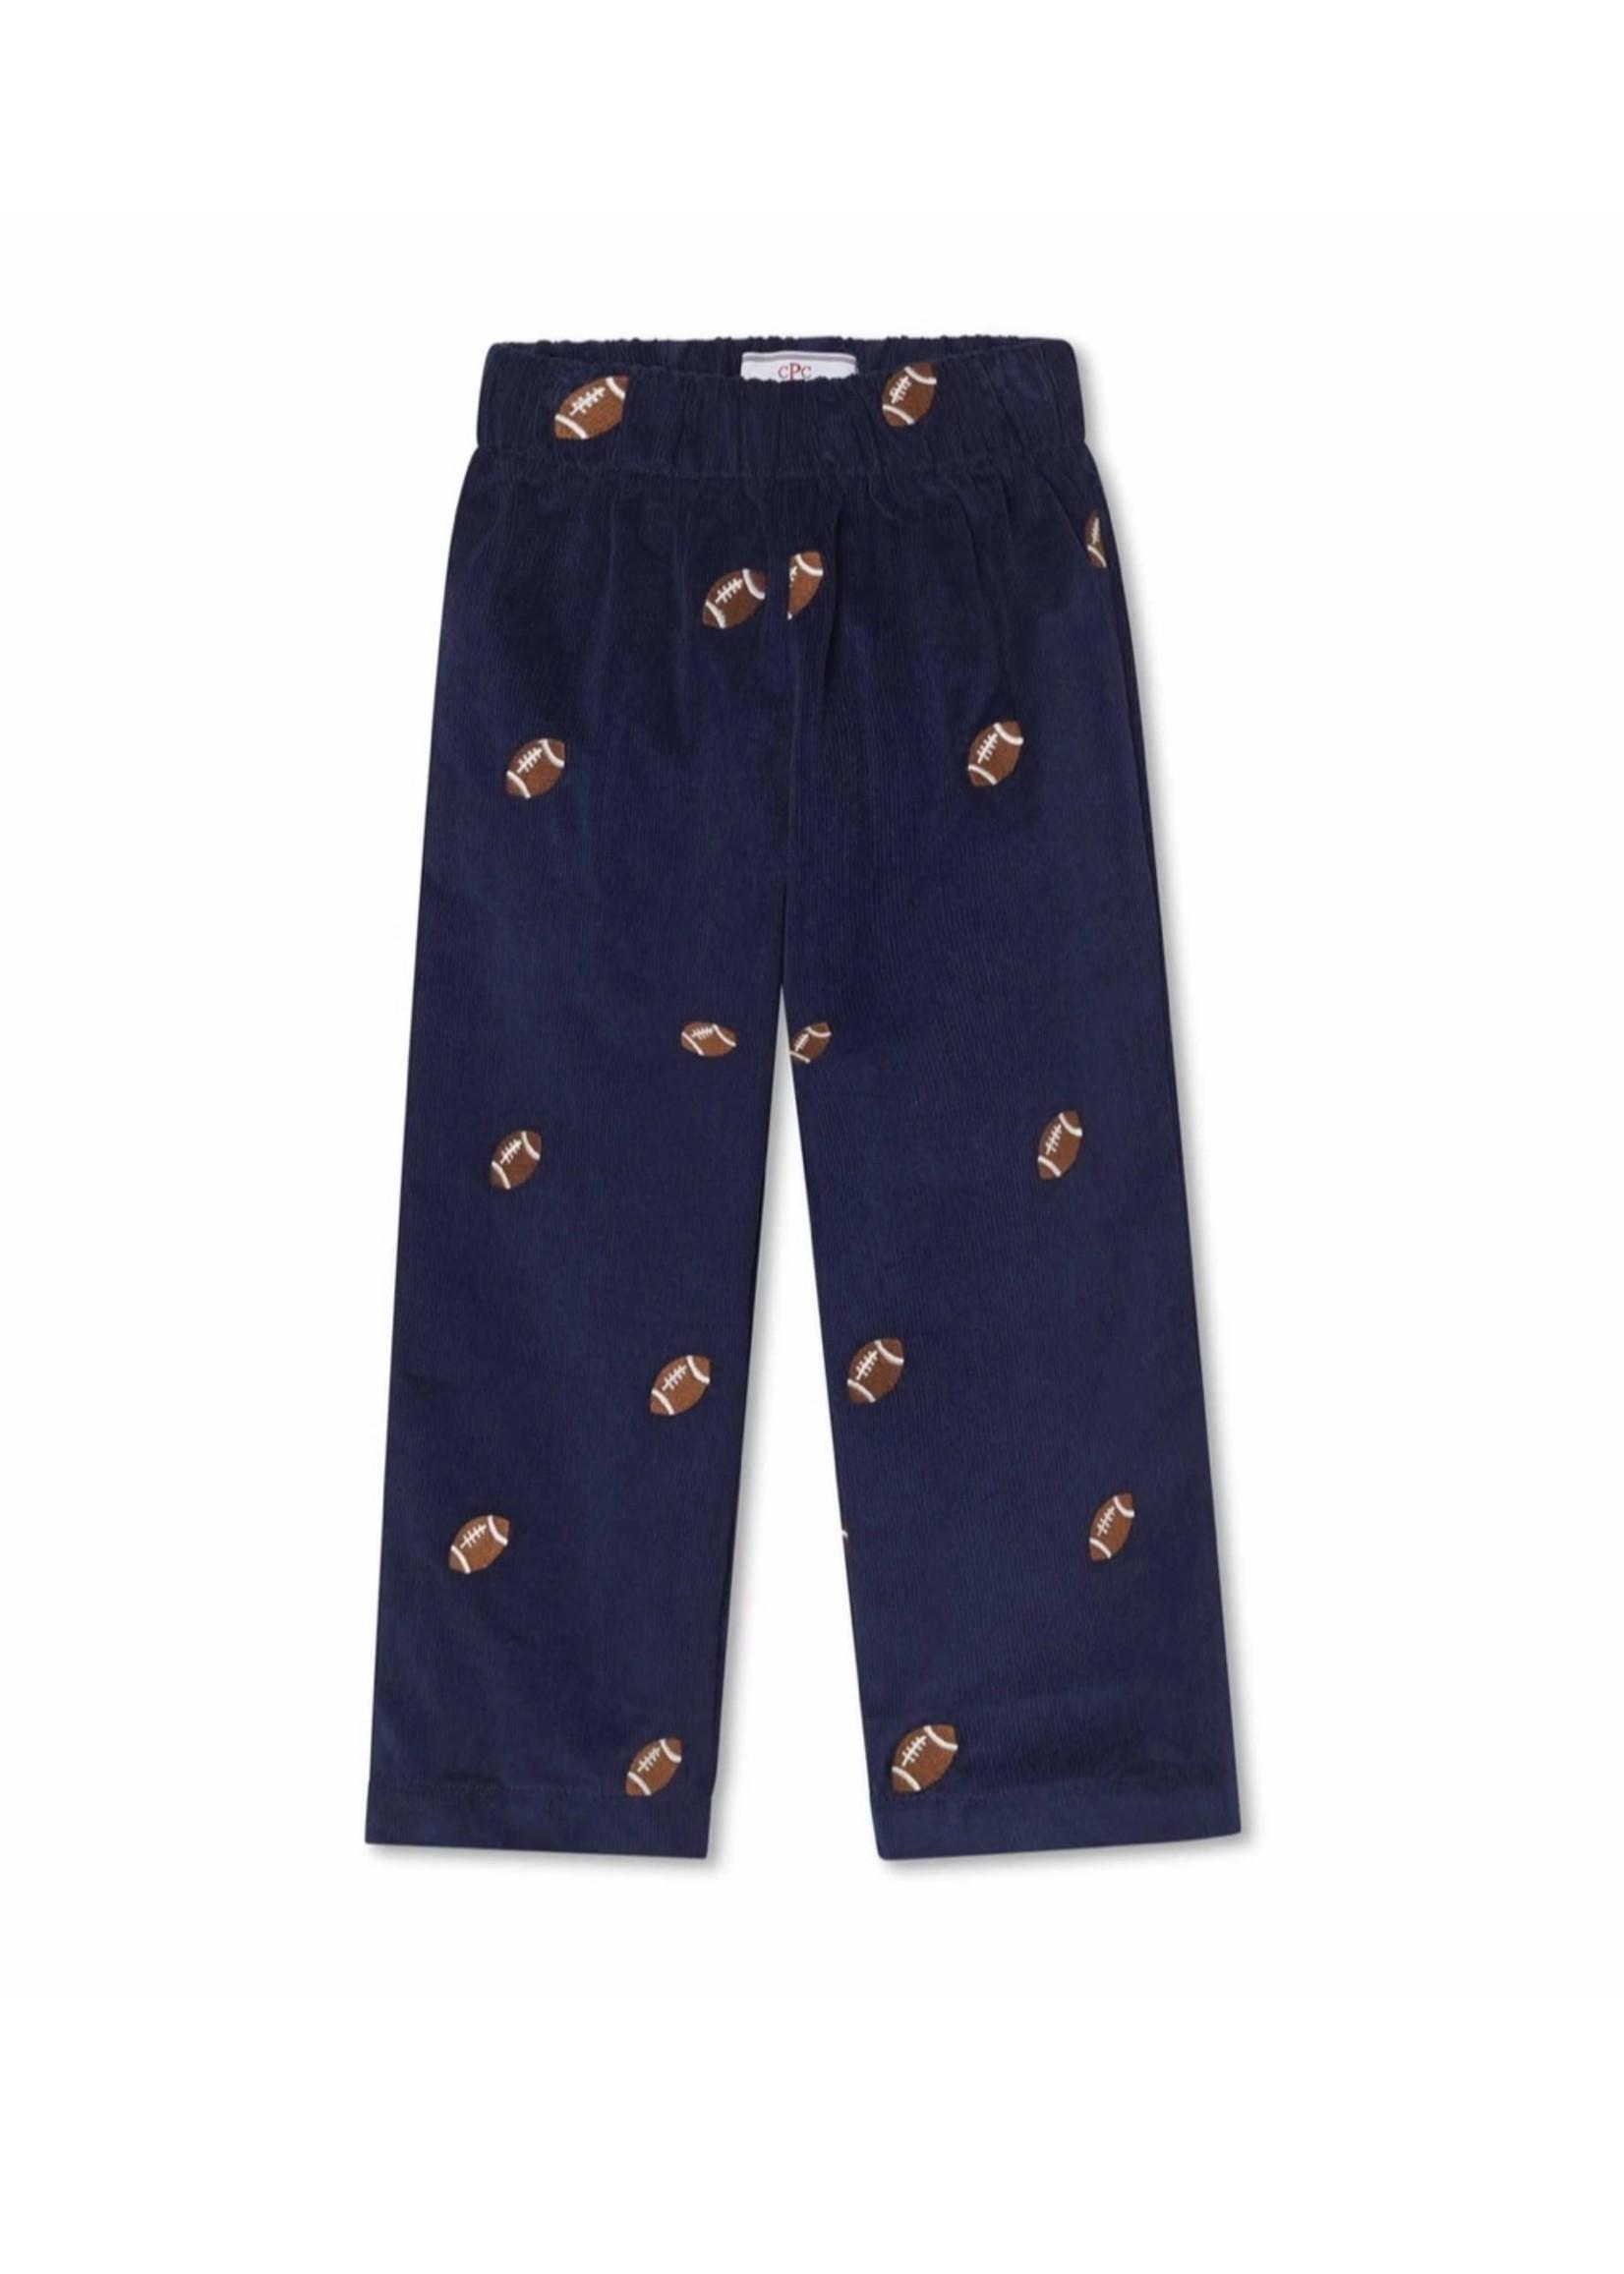 Myles Slim Pant - Medieval Blue w/ Football Embroidery